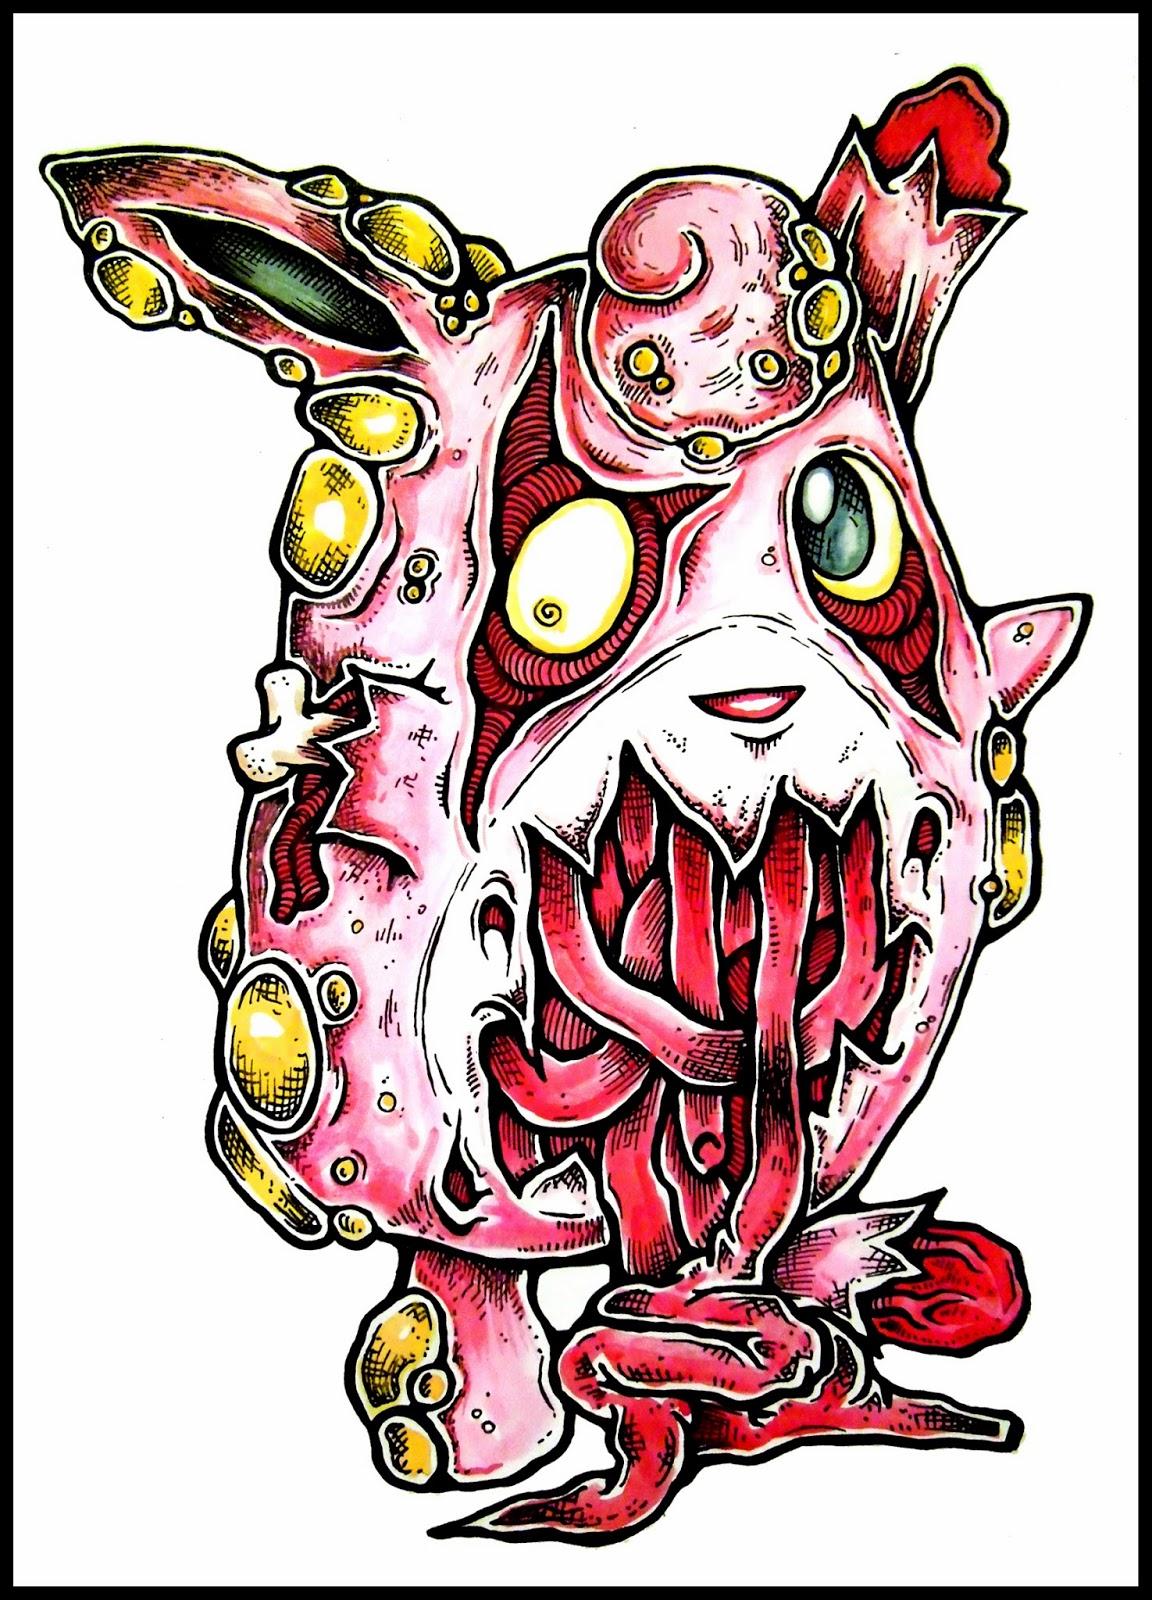 Hard Pokemon To Draw | www.pixshark.com - Images Galleries ...